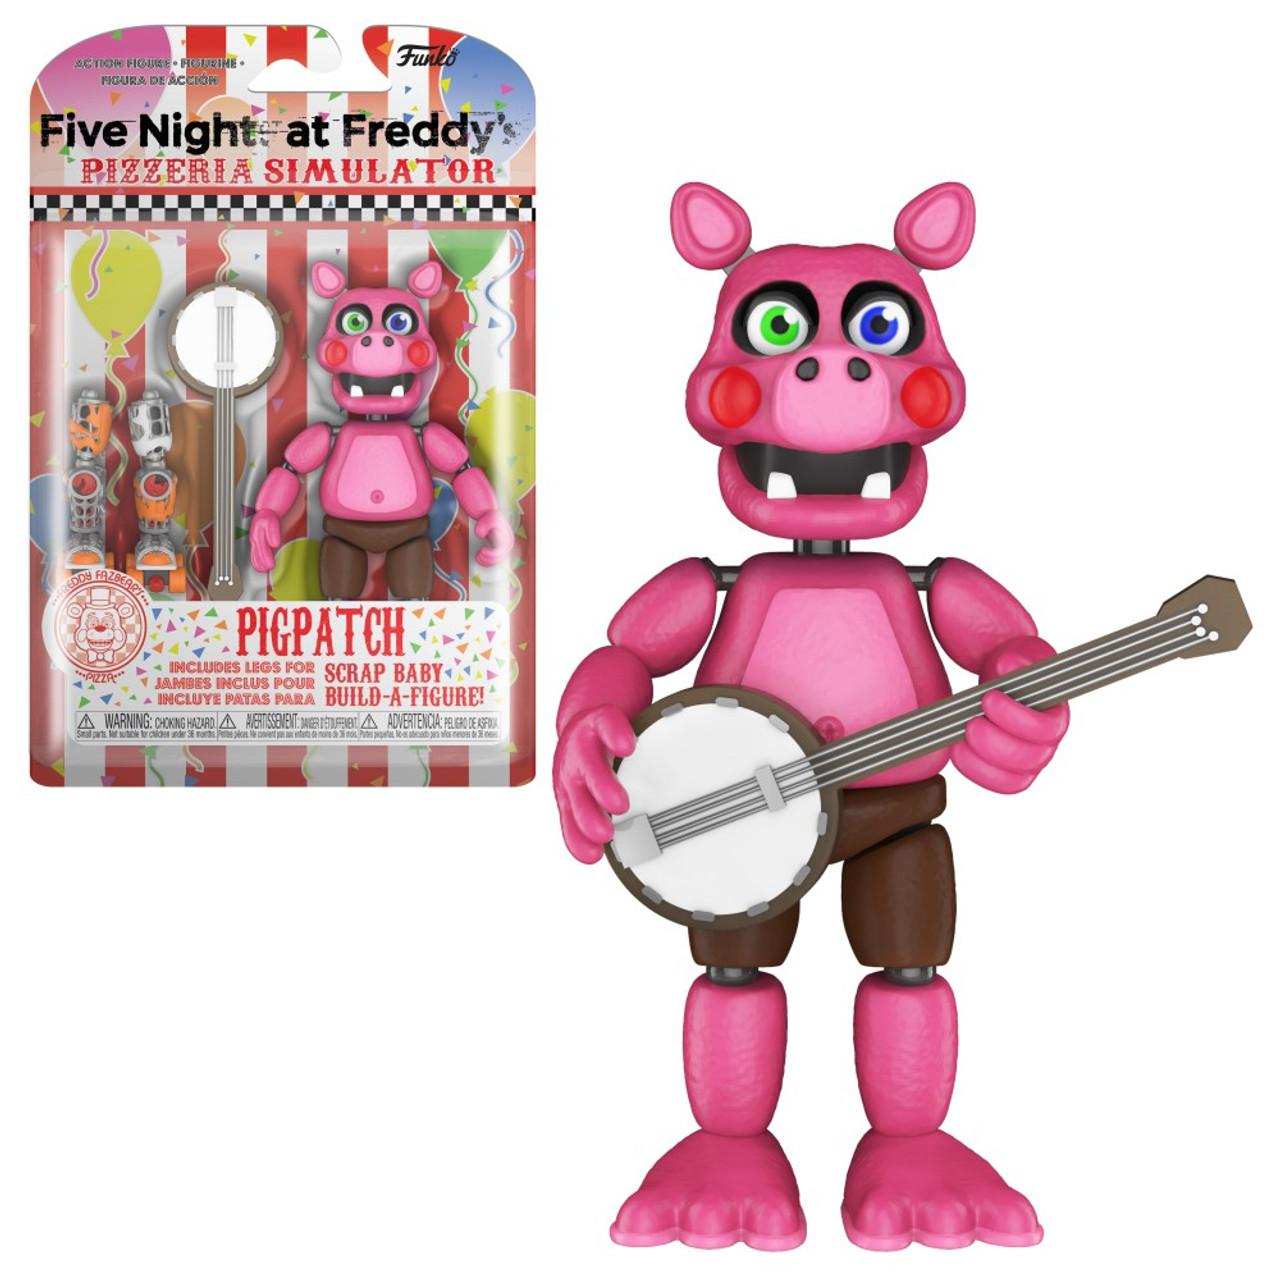 Fnk Toys FNAF Five Nights at Freddy/'s Pizza Simulator PIGPATCH Figure